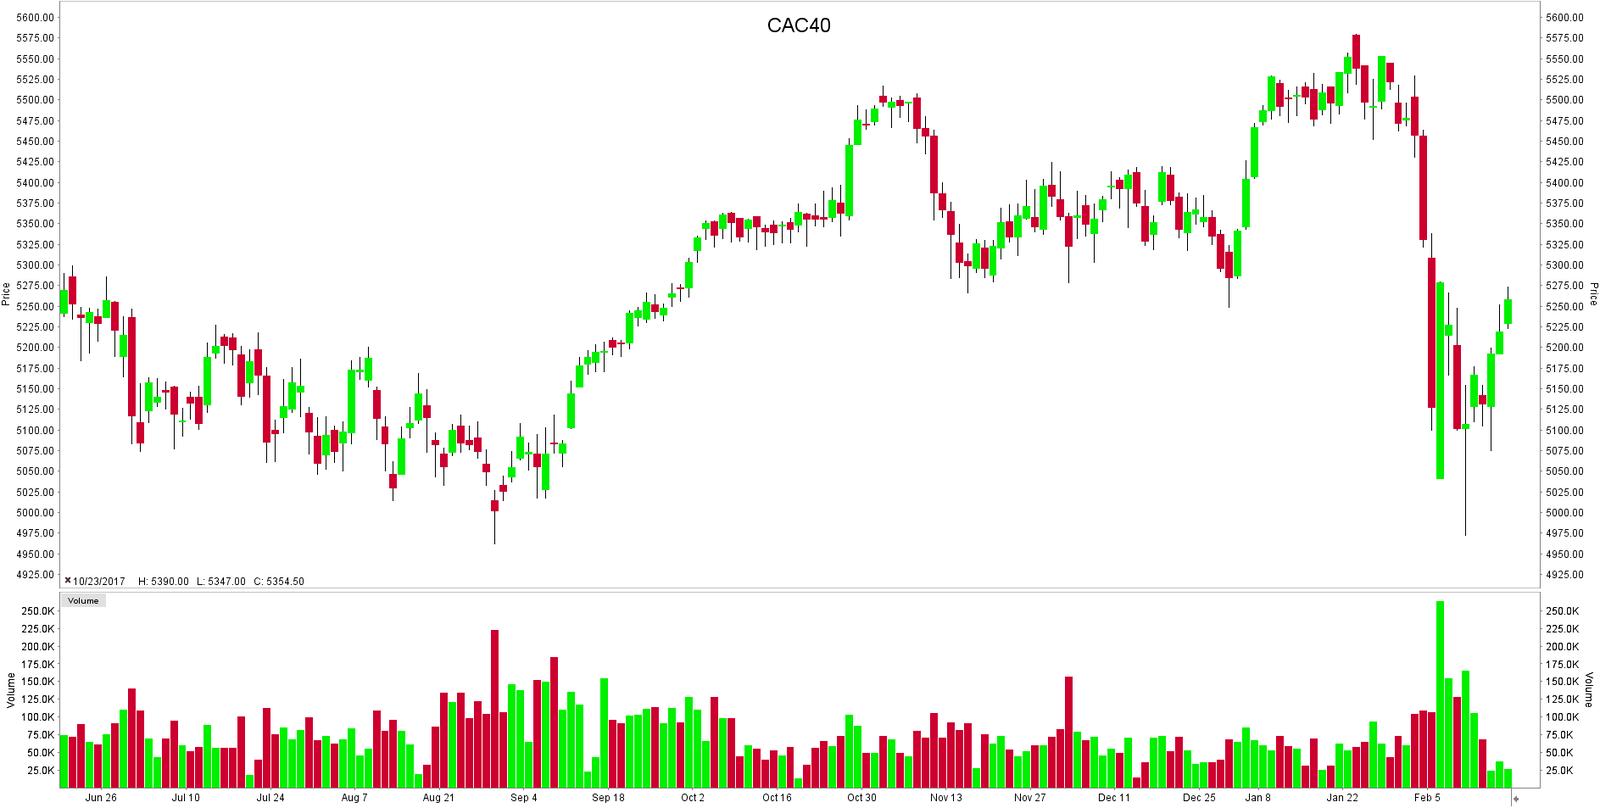 CAC40 Index Koers Grafiek Beleggen